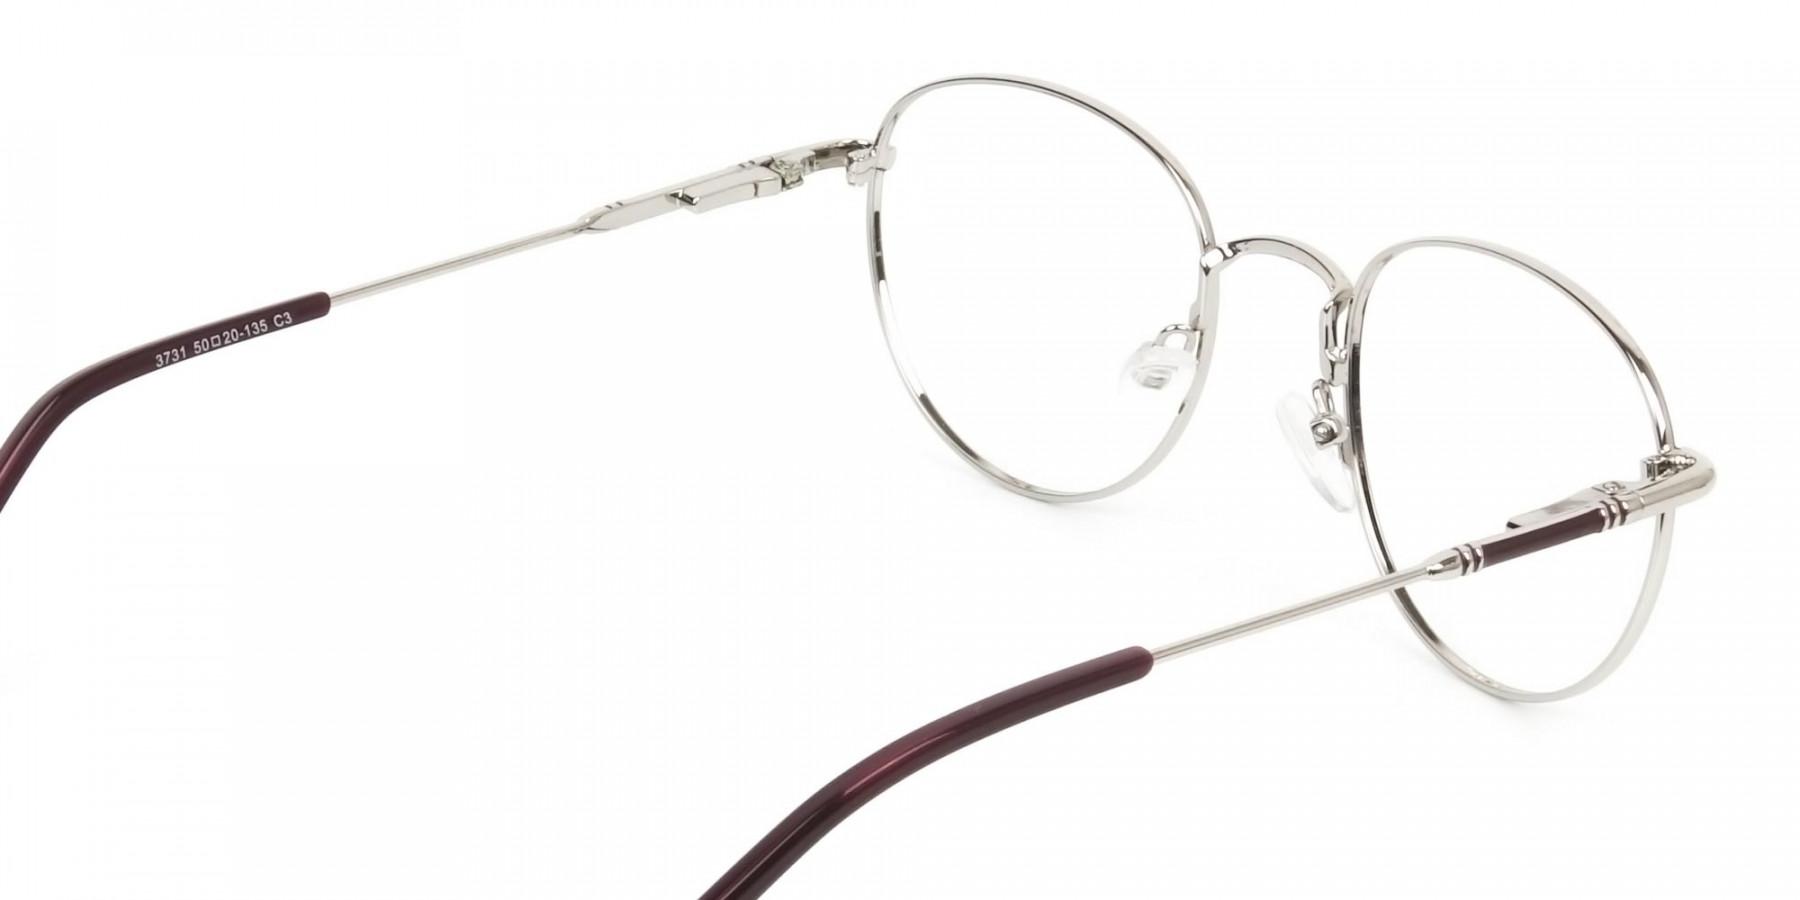 Lightweight Burgundy & Silver Round Spectacles  - 1